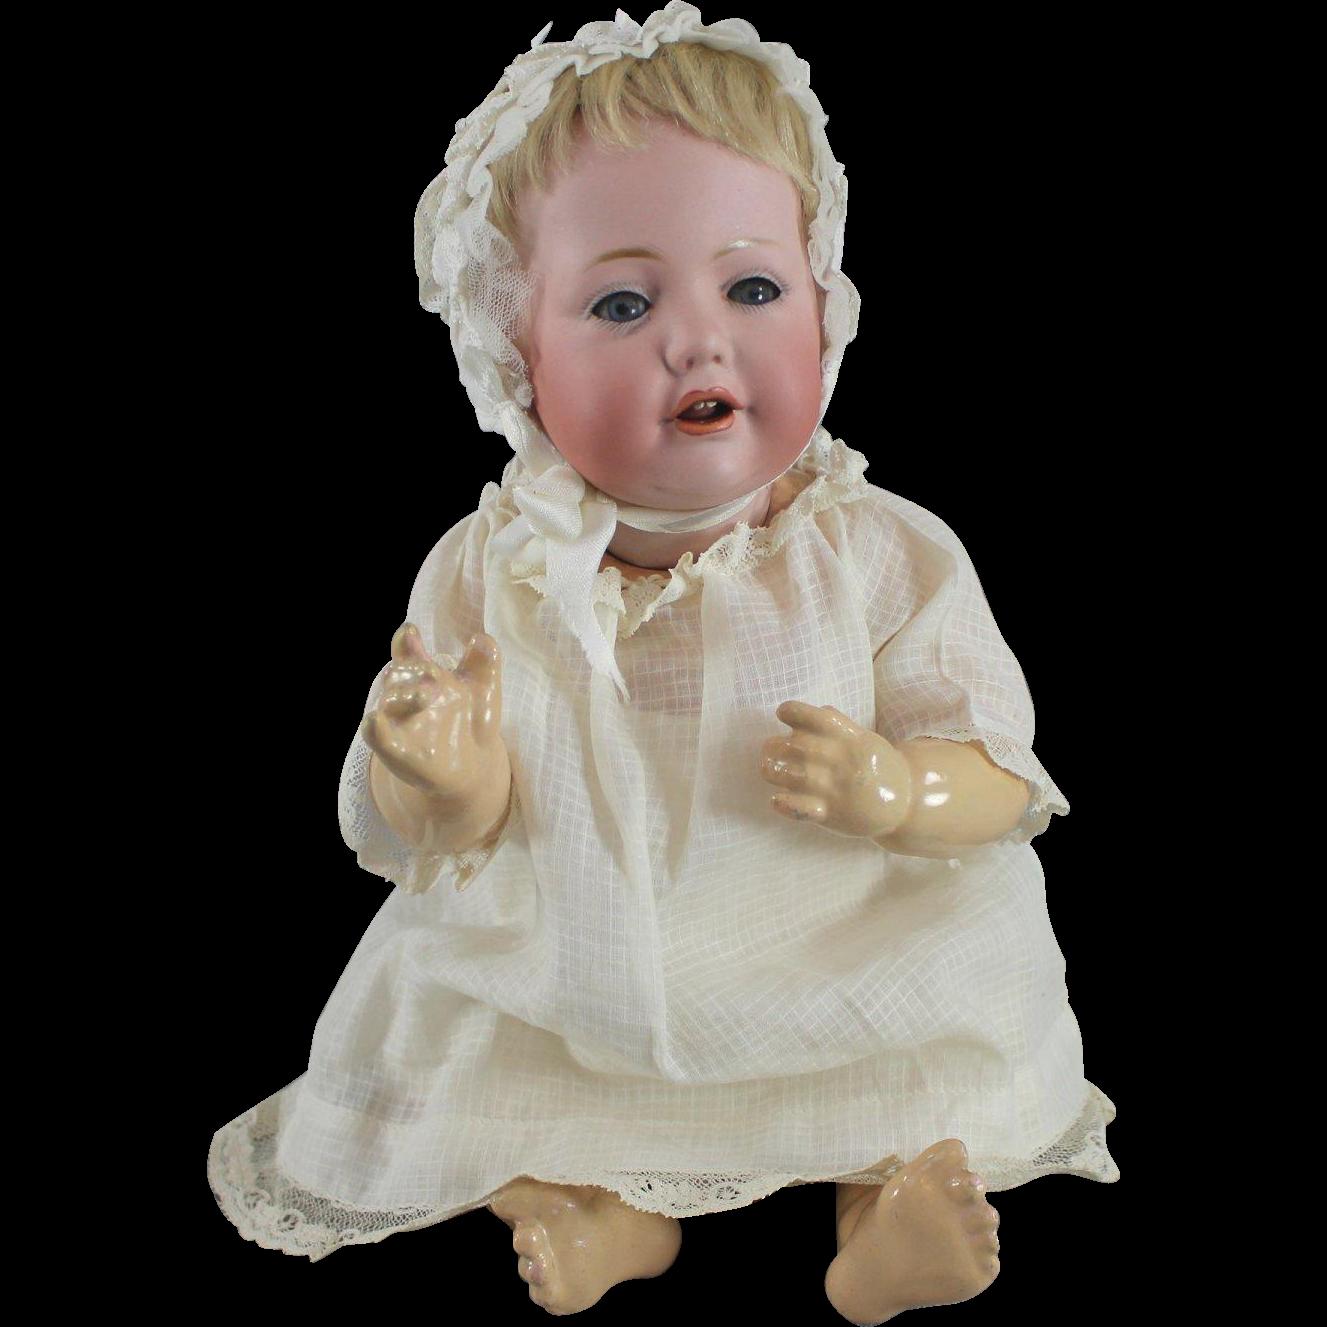 Hilda by Kestner Baby Doll Original Wig Plaster Pate Factory Costume